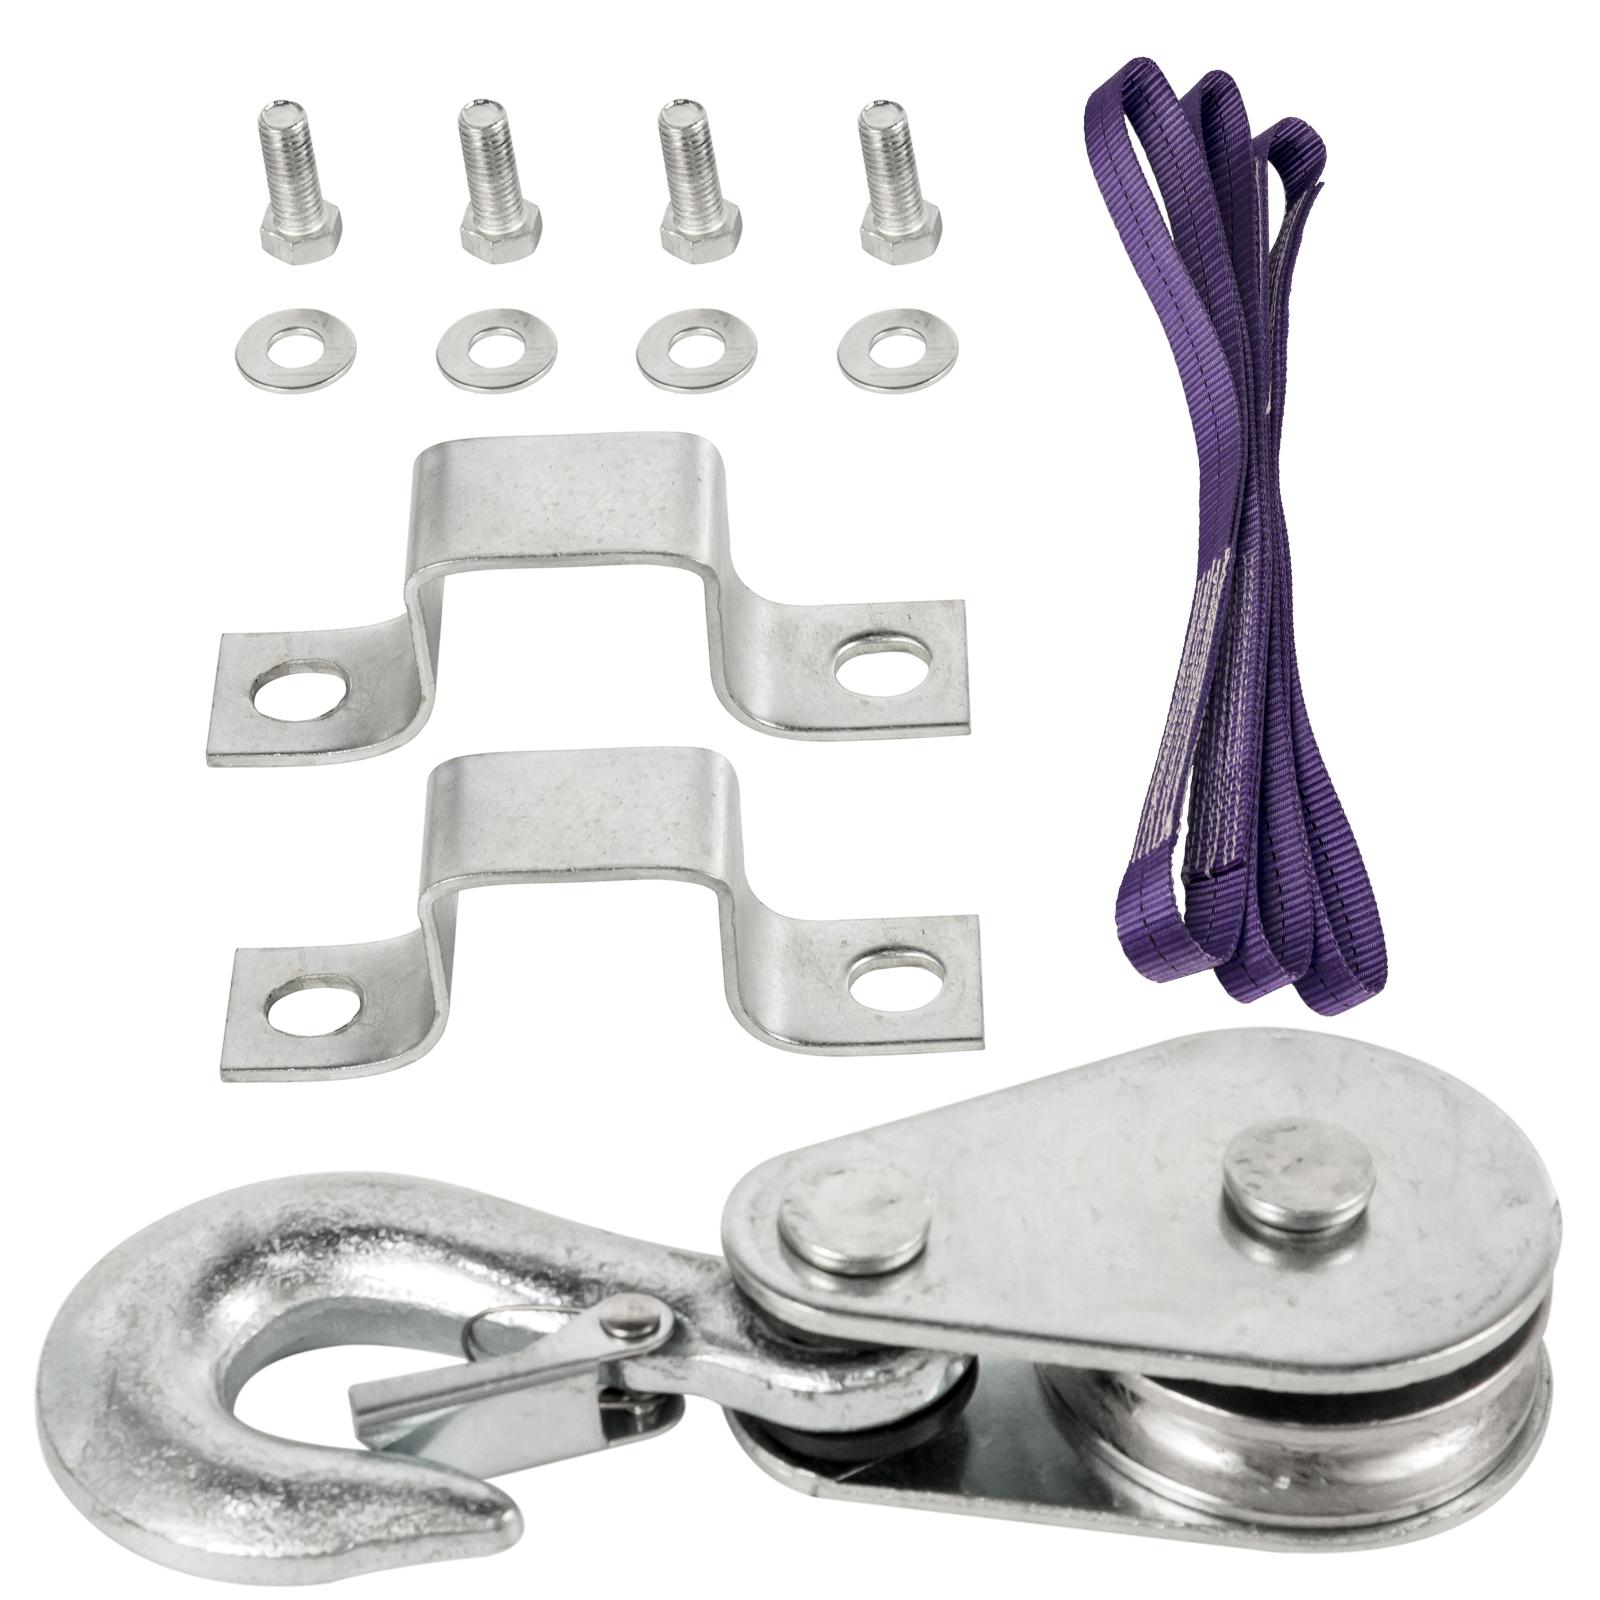 100kg-900kg-Electric-Hoist-Winch-Lifting-Engine-Crane-Cable-Lift-Hook-Garage miniature 81